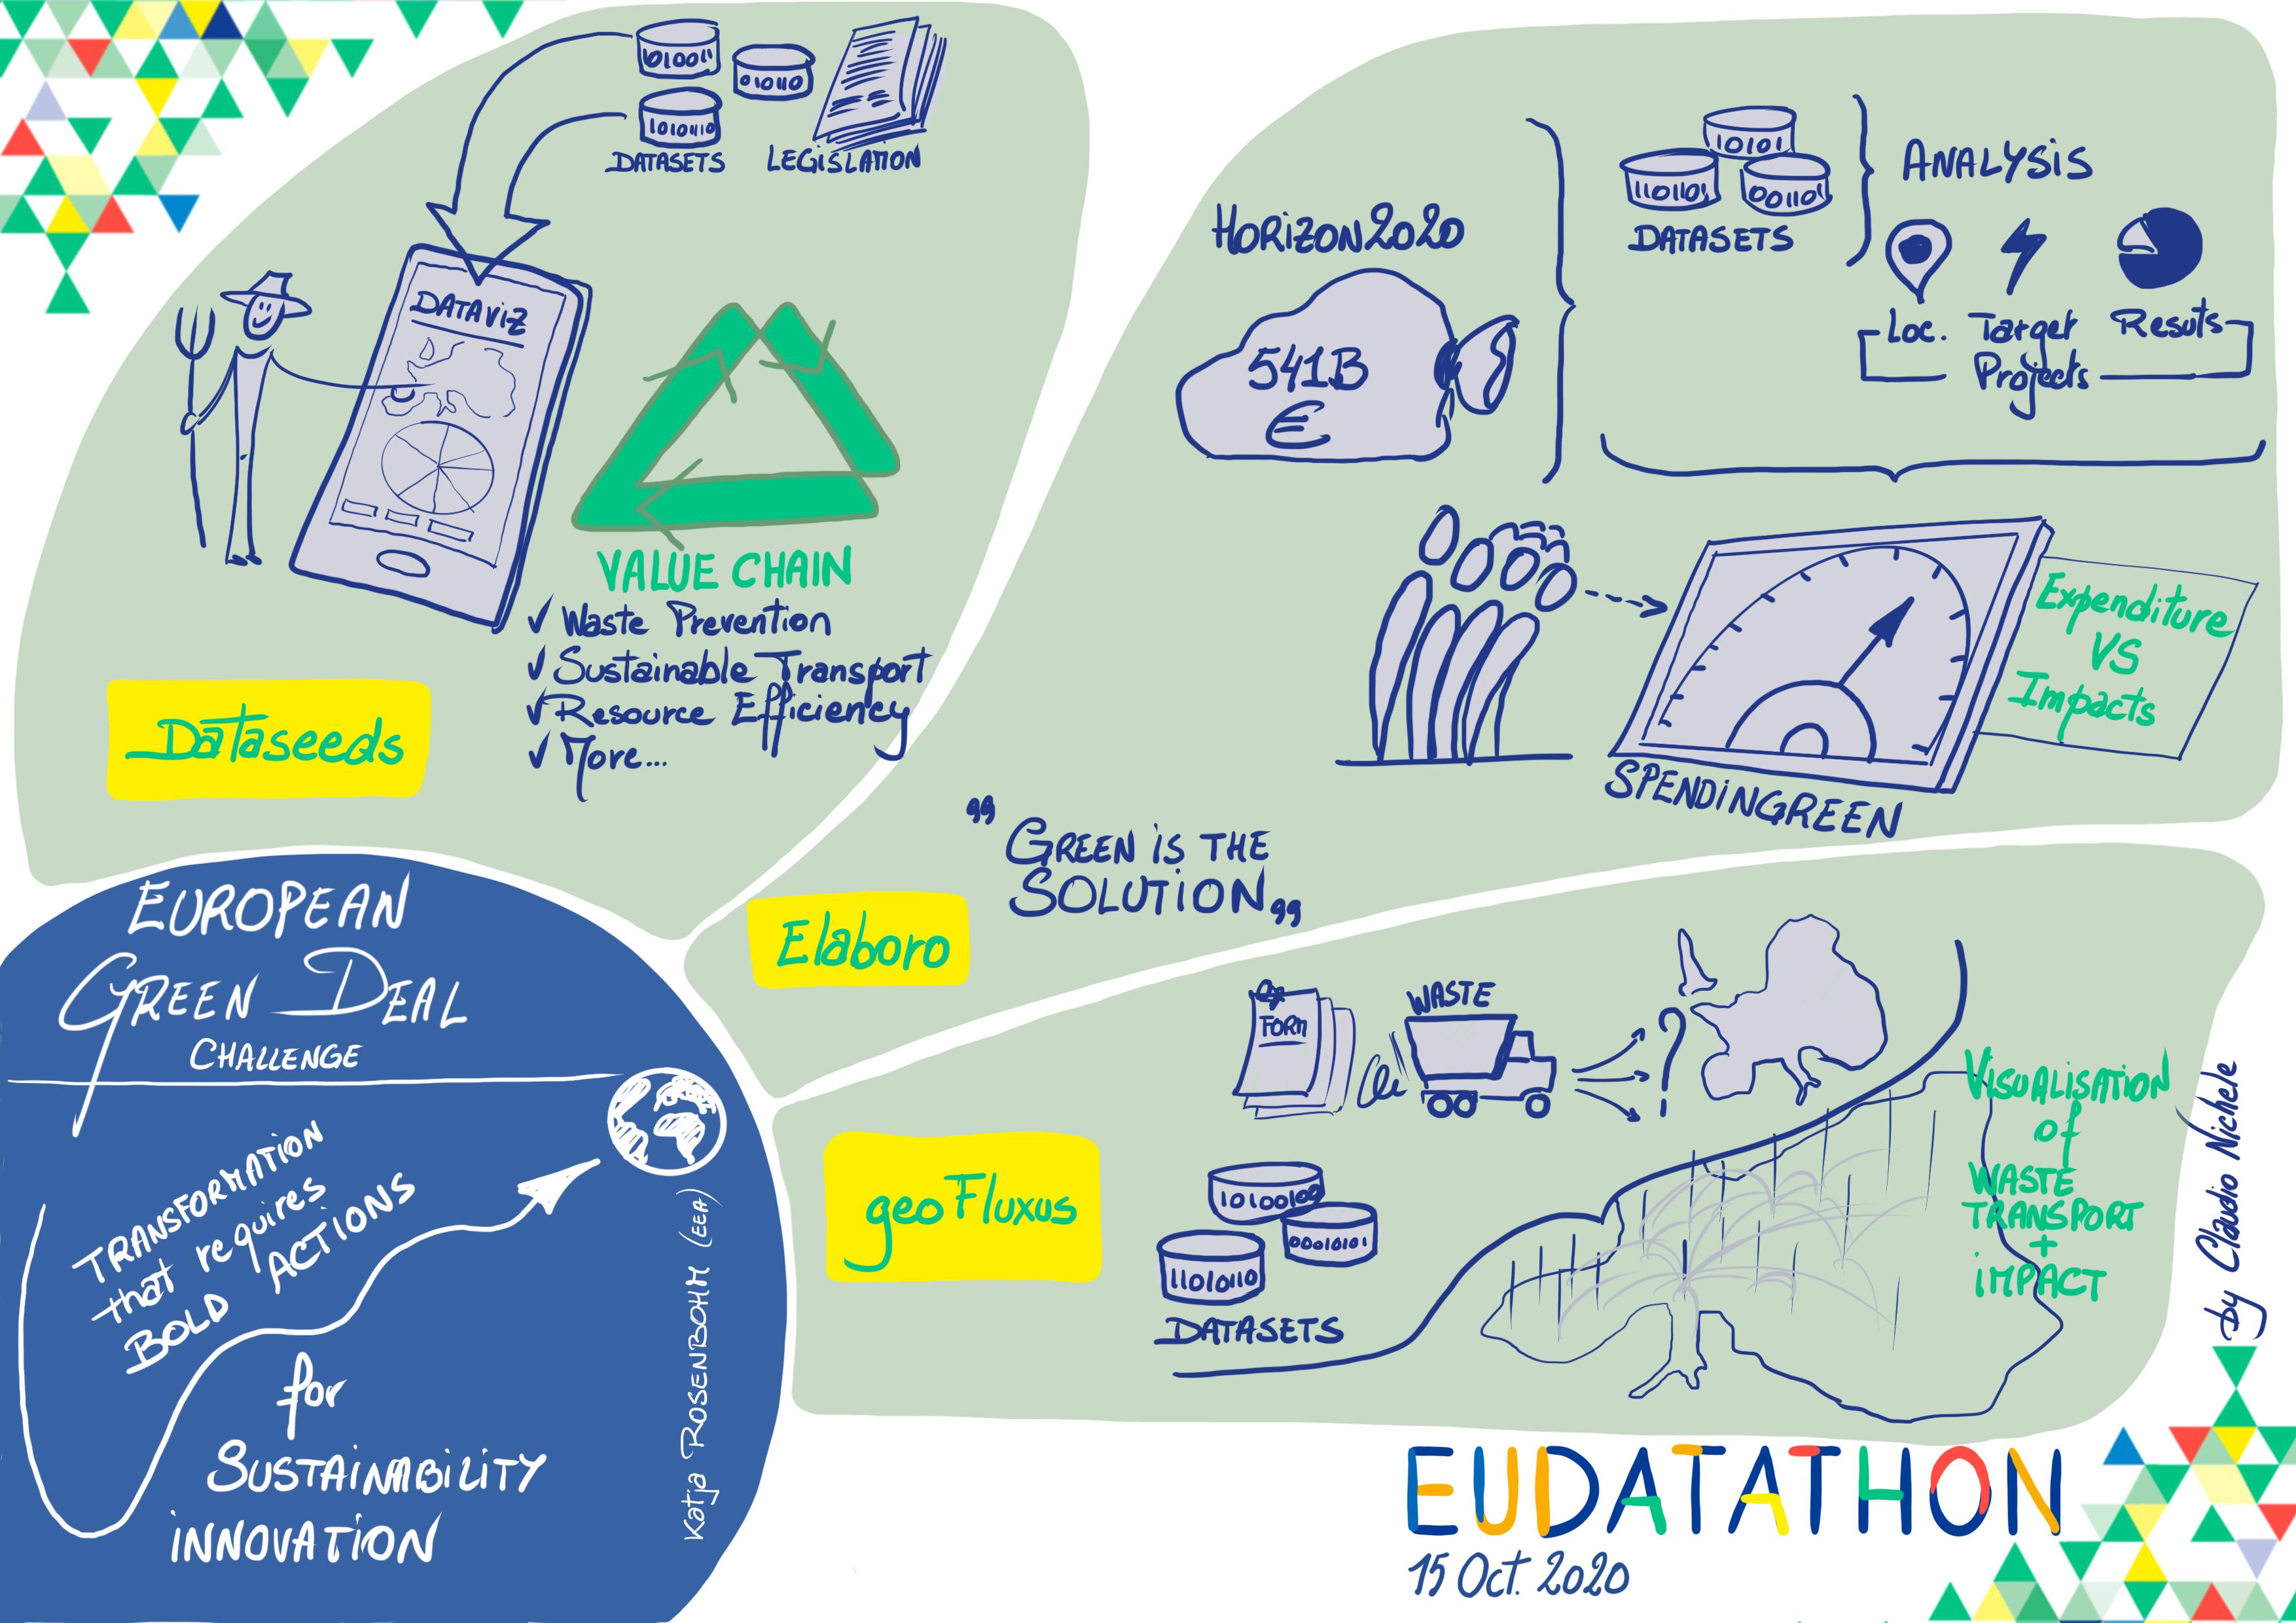 EU Datathon 2020 challenge 1